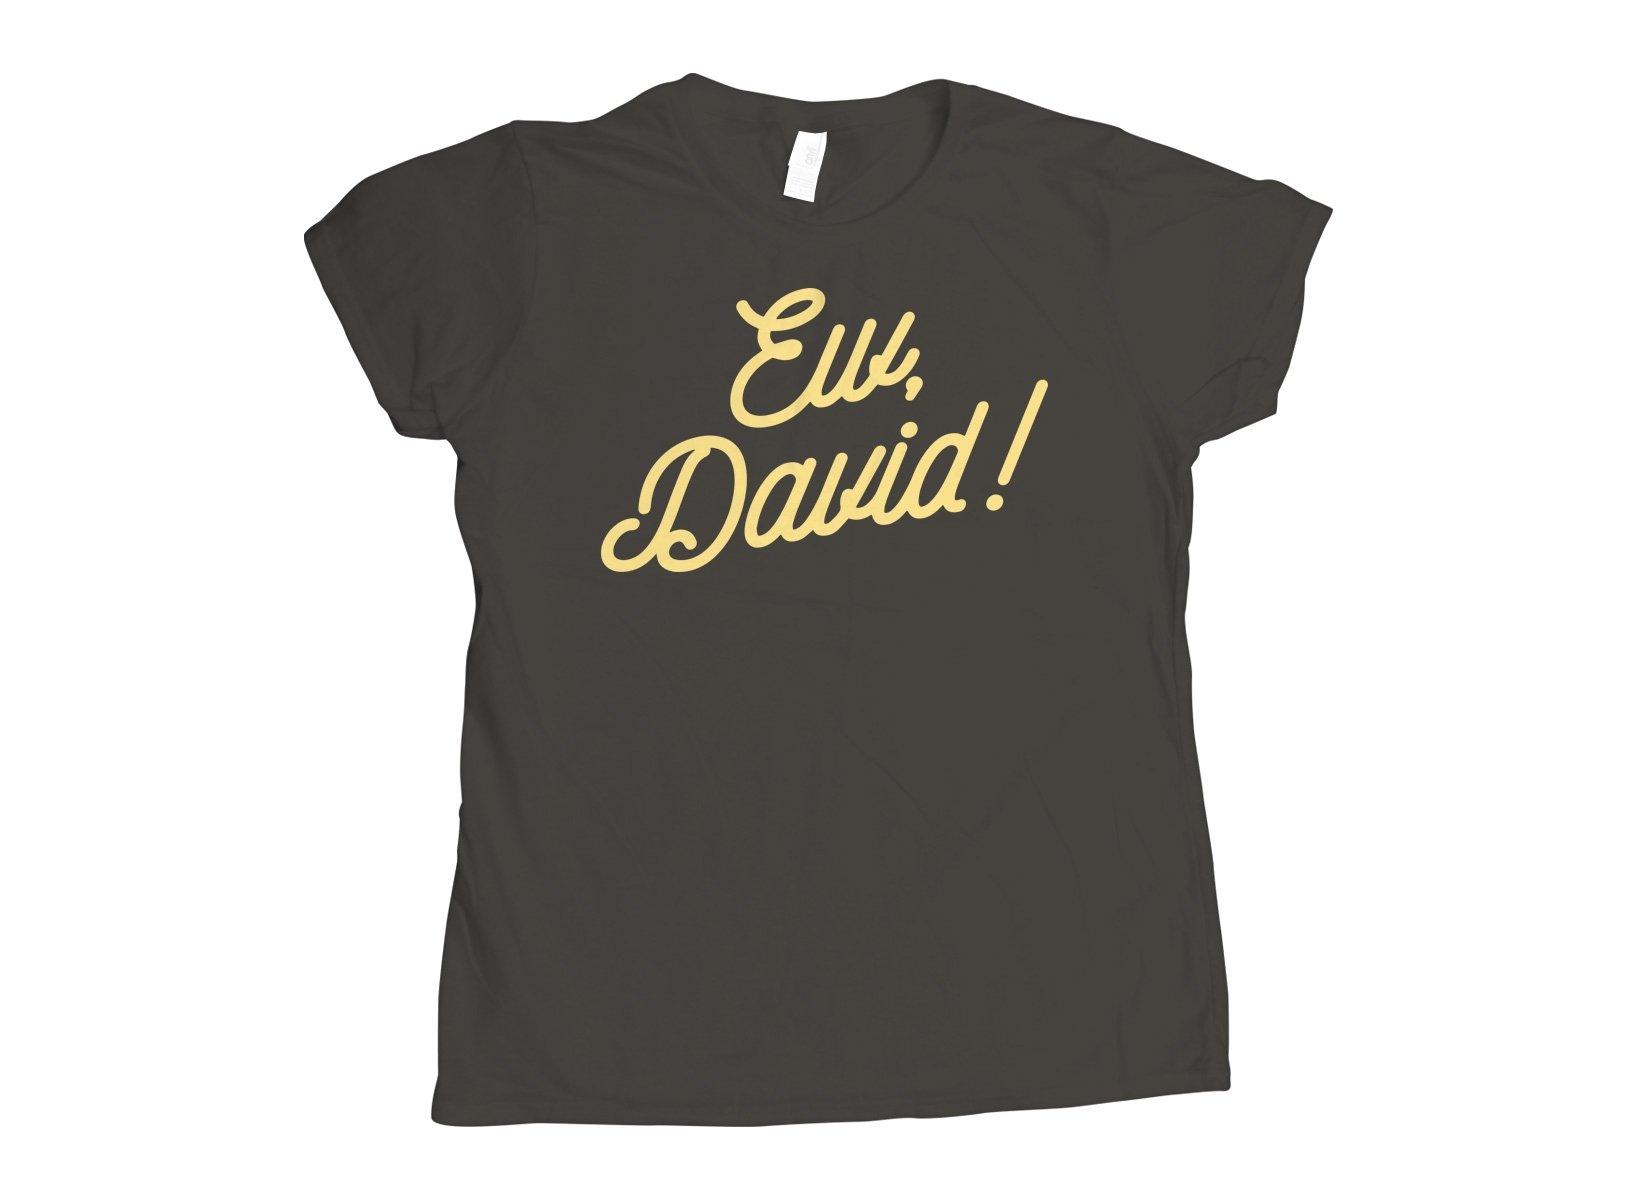 Ew, David! on Womens T-Shirt